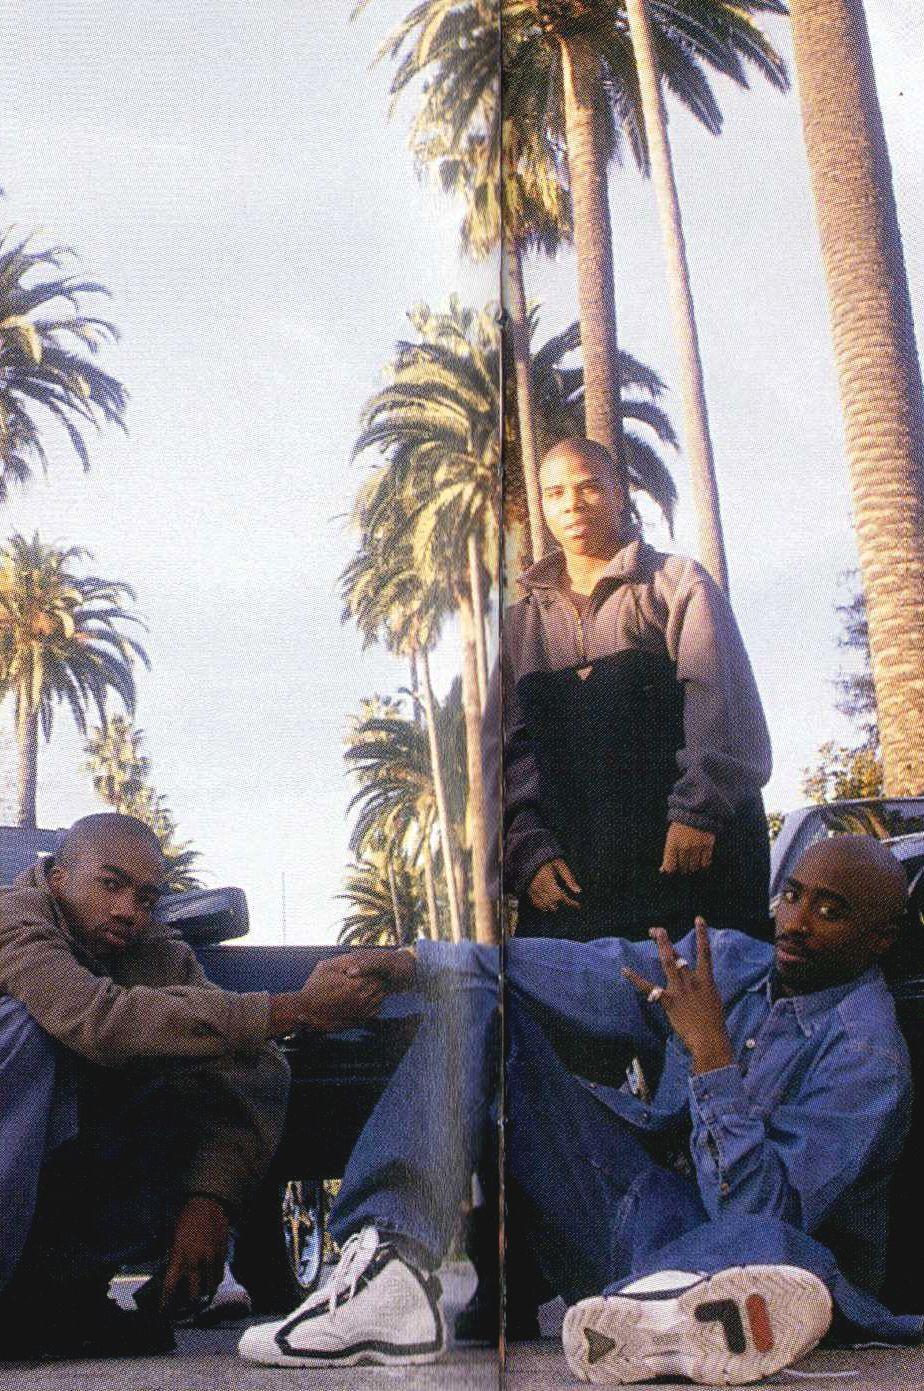 Kastro, Napoleon & Tupac Shakur (RIP) Outlawz | Rap musik